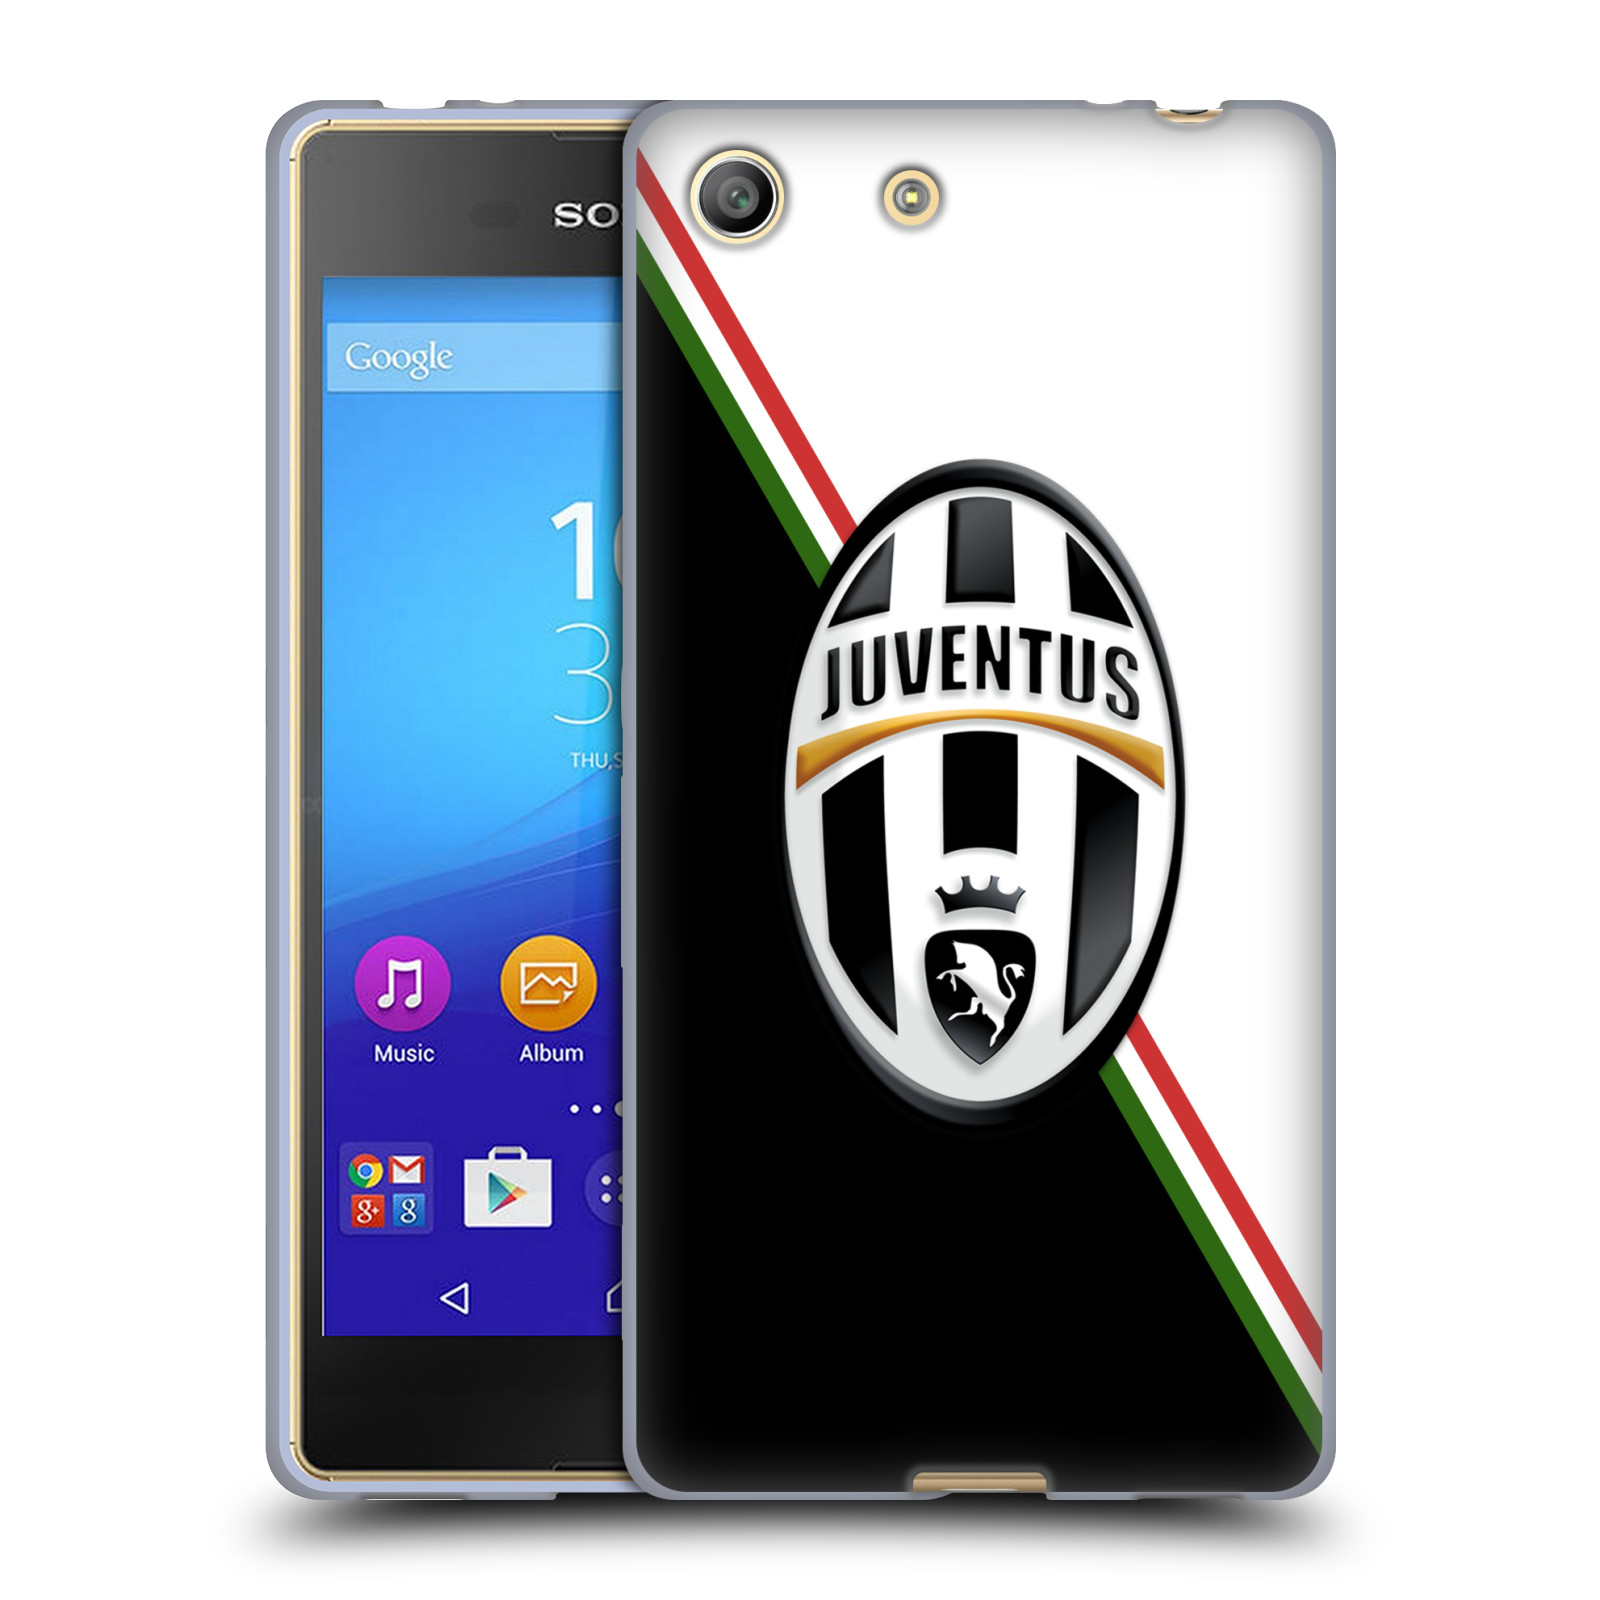 Silikonové pouzdro na mobil Sony Xperia M5 HEAD CASE Juventus FC - Black and White (Silikonový kryt či obal na mobilní telefon Juventus FC Official pro Sony Xperia M5 Dual SIM / Aqua)